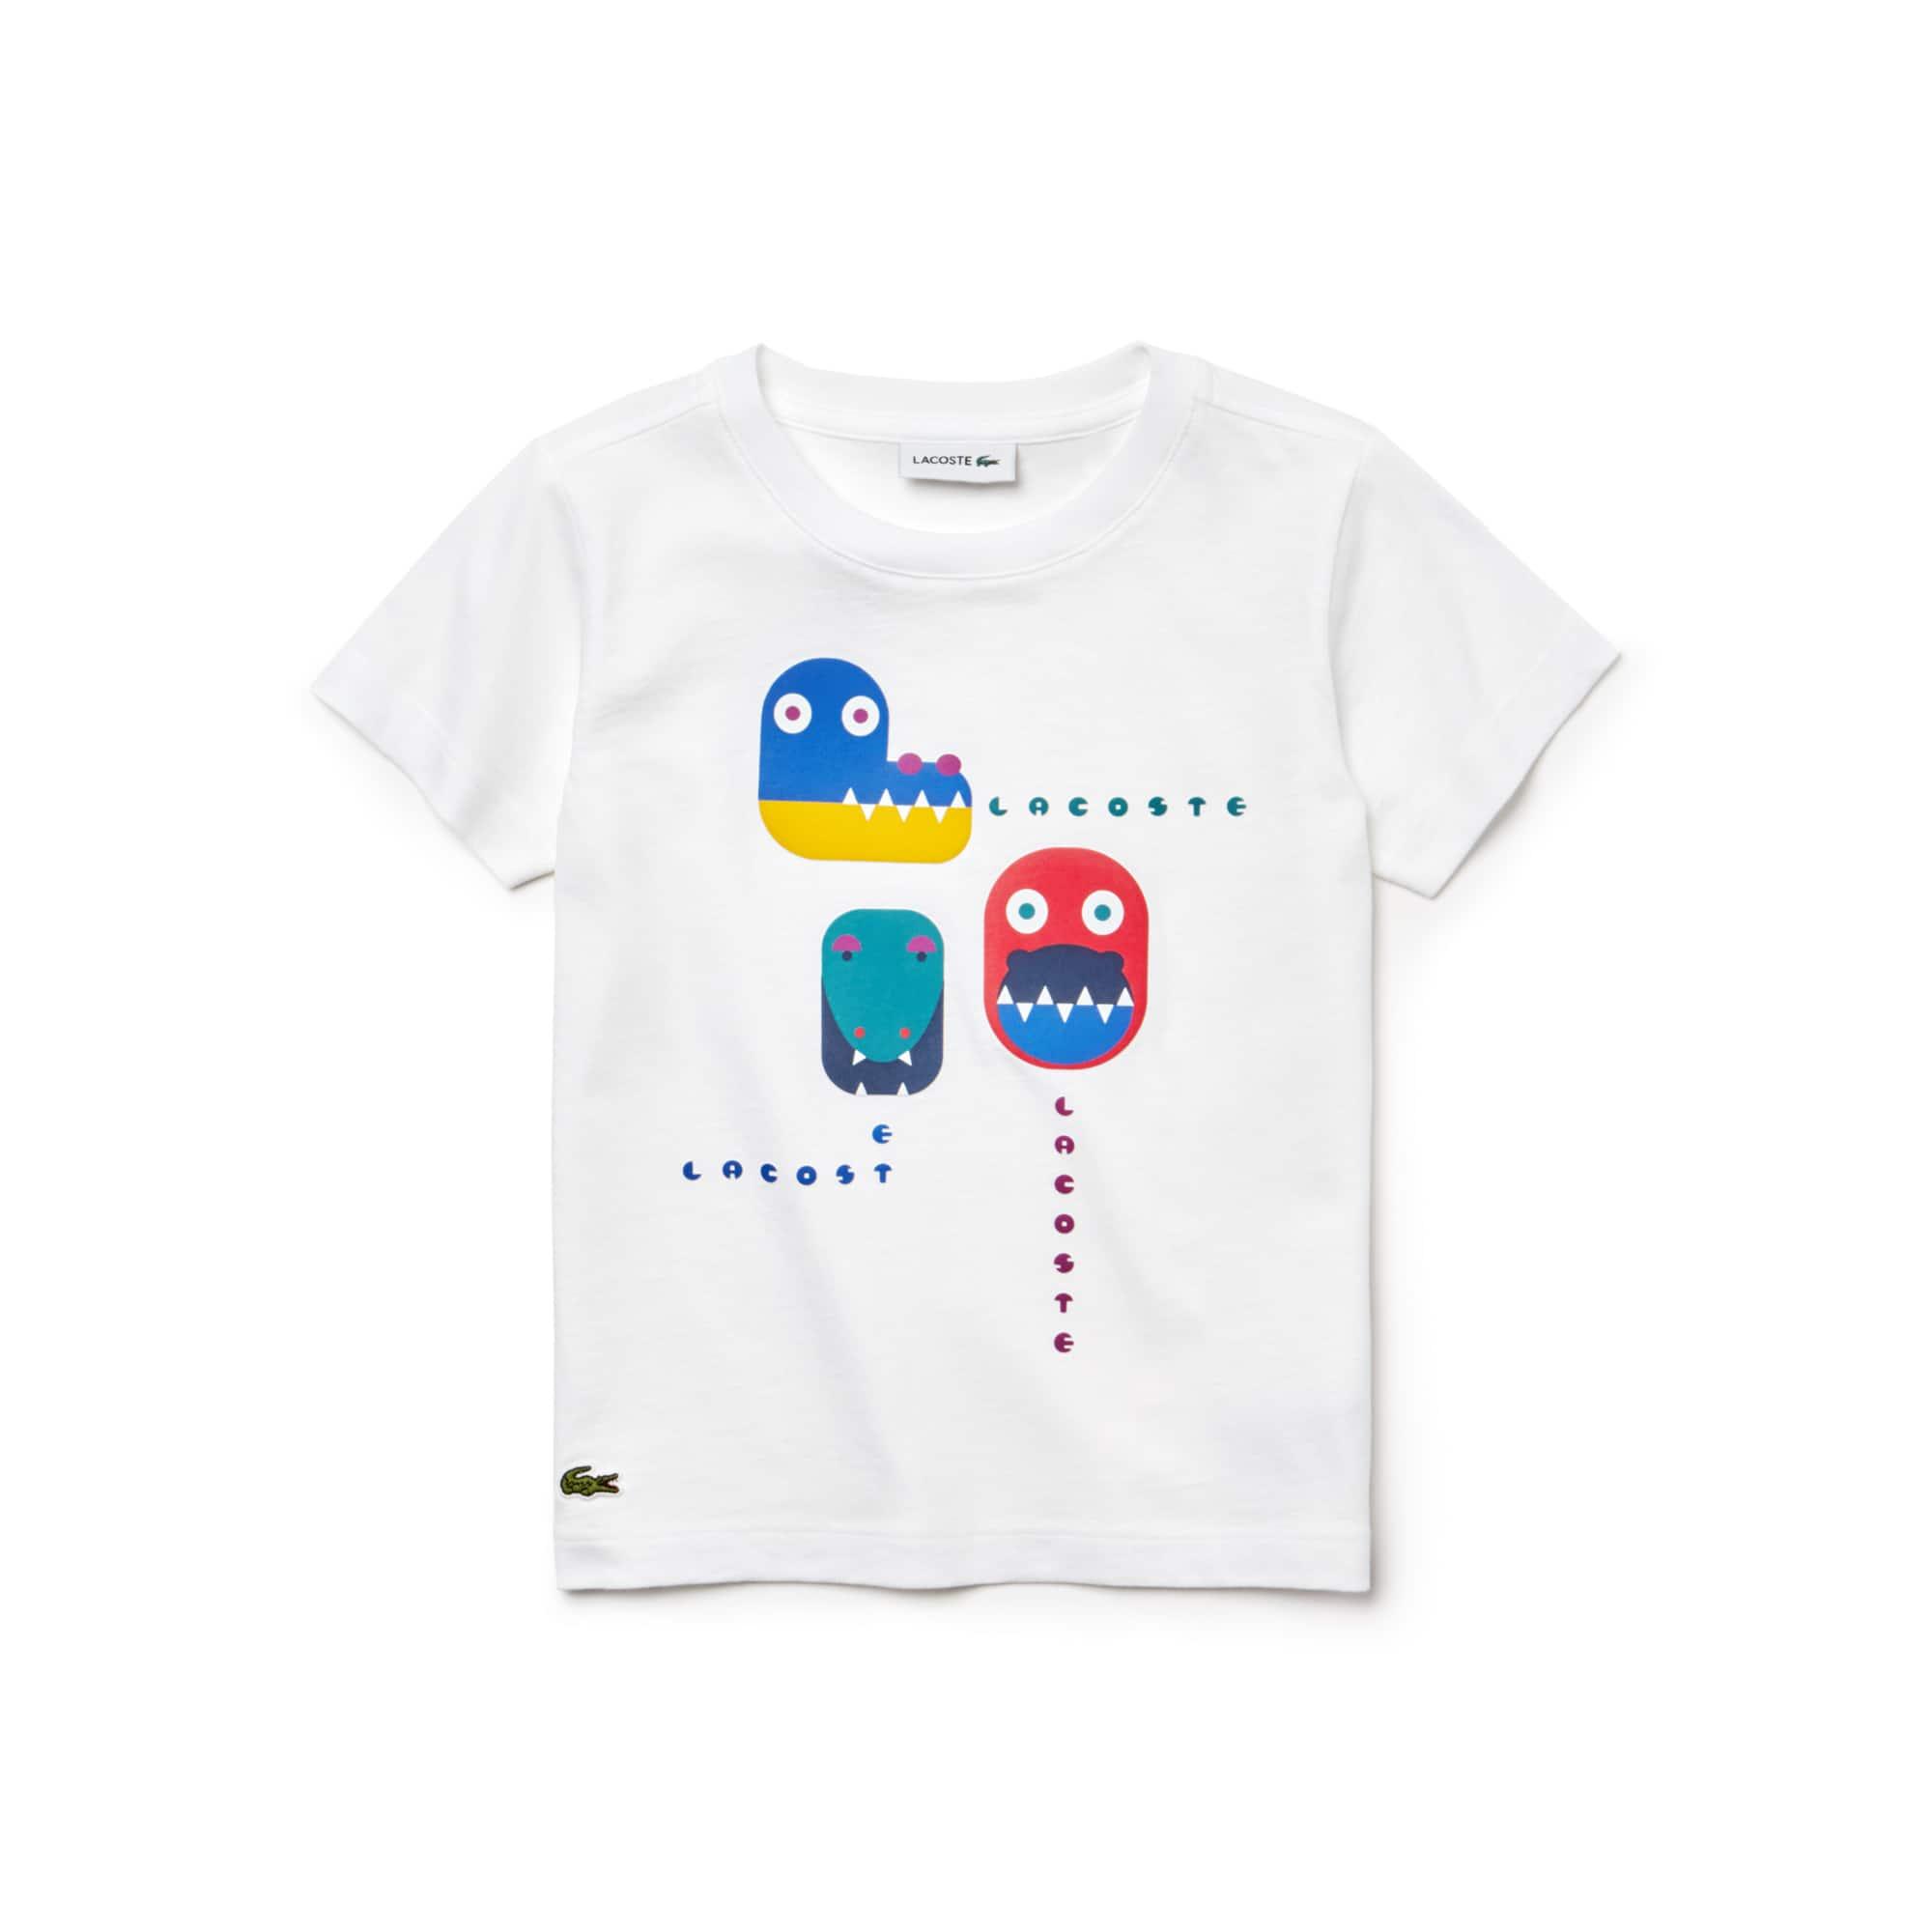 Boys' Crew Neck Crocodile Print Cotton Jersey T-shirt